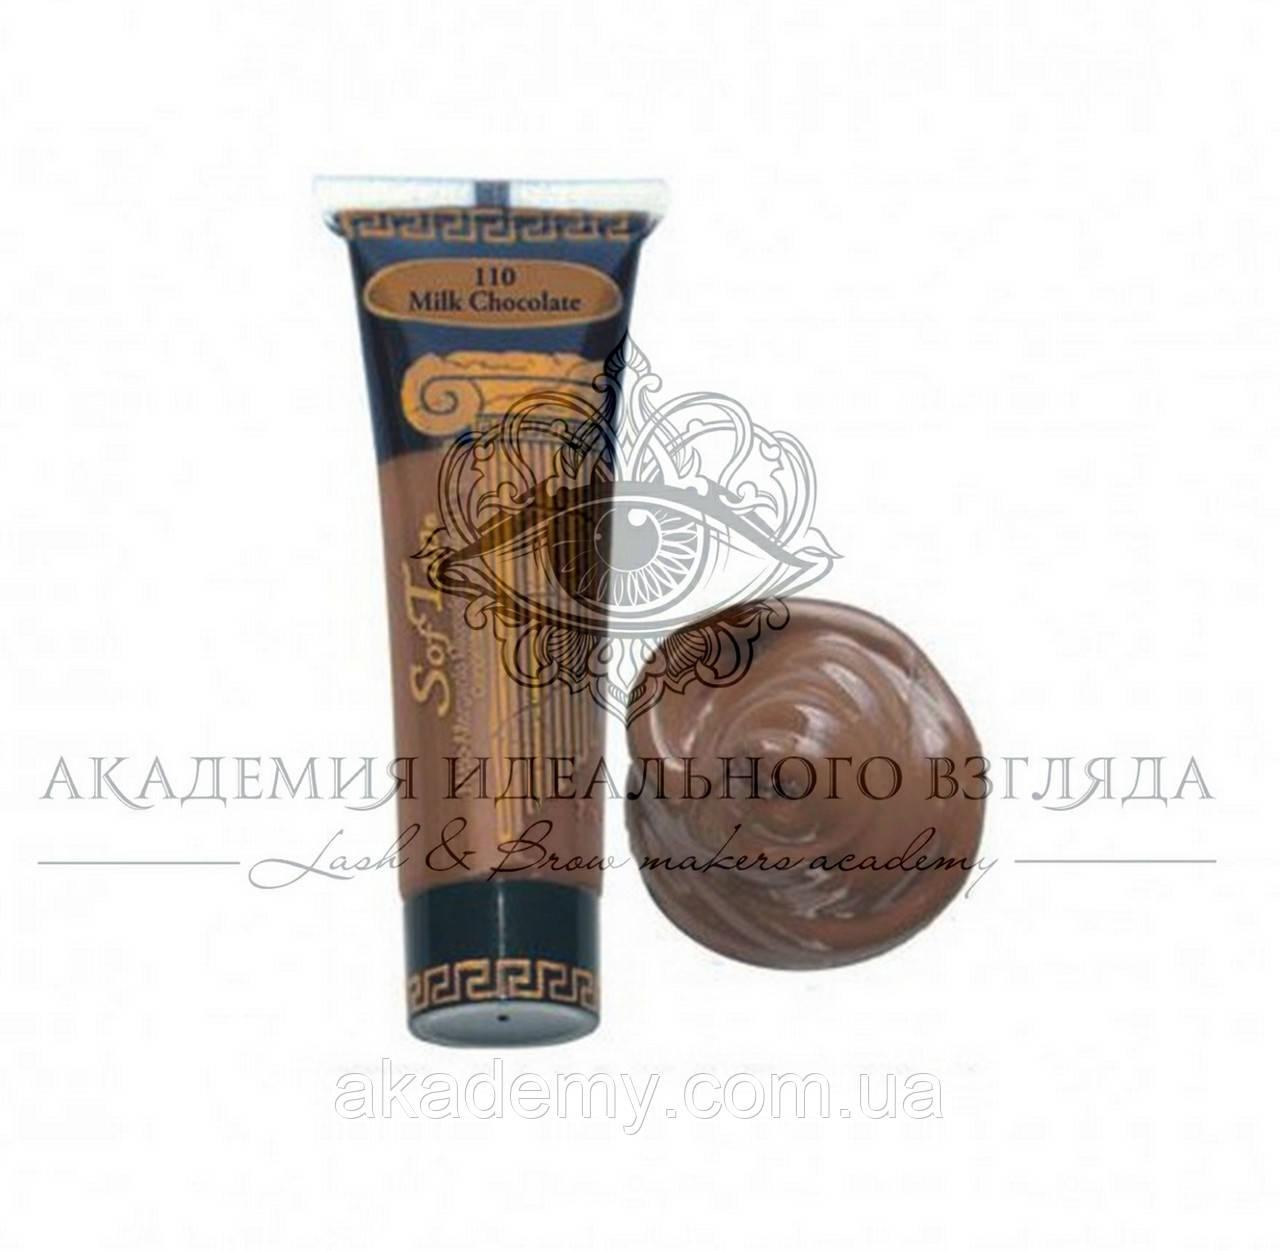 Пигмент Softap 110 (Молочный Шоколад / Milk Chocolate)